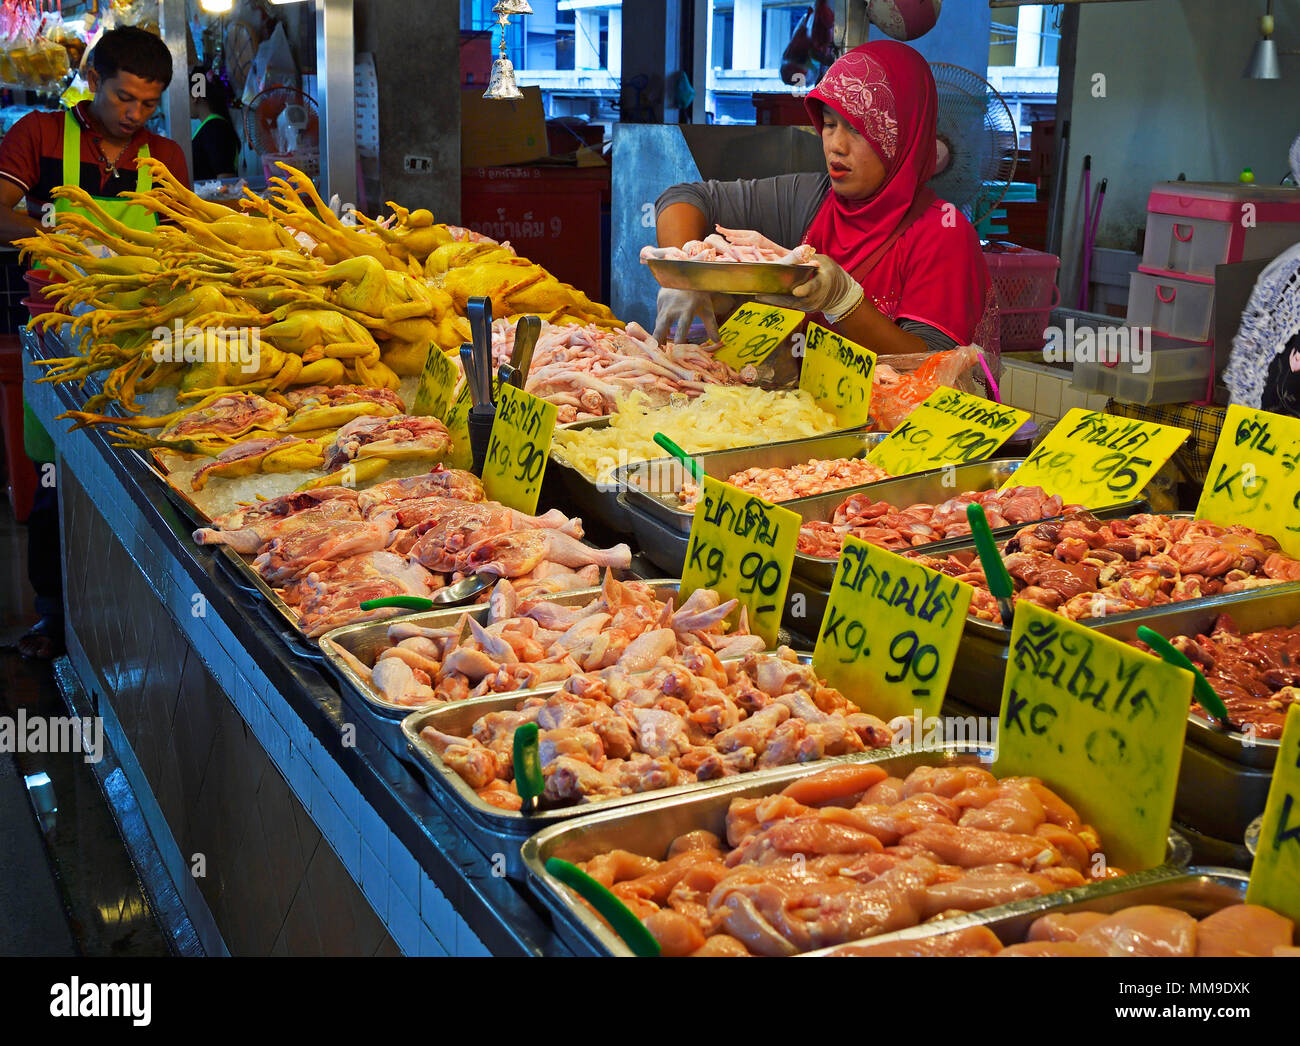 Fresh poultry meat at Banzaan Fresh Market, Patong Beach, Phuket, Thailand - Stock Image